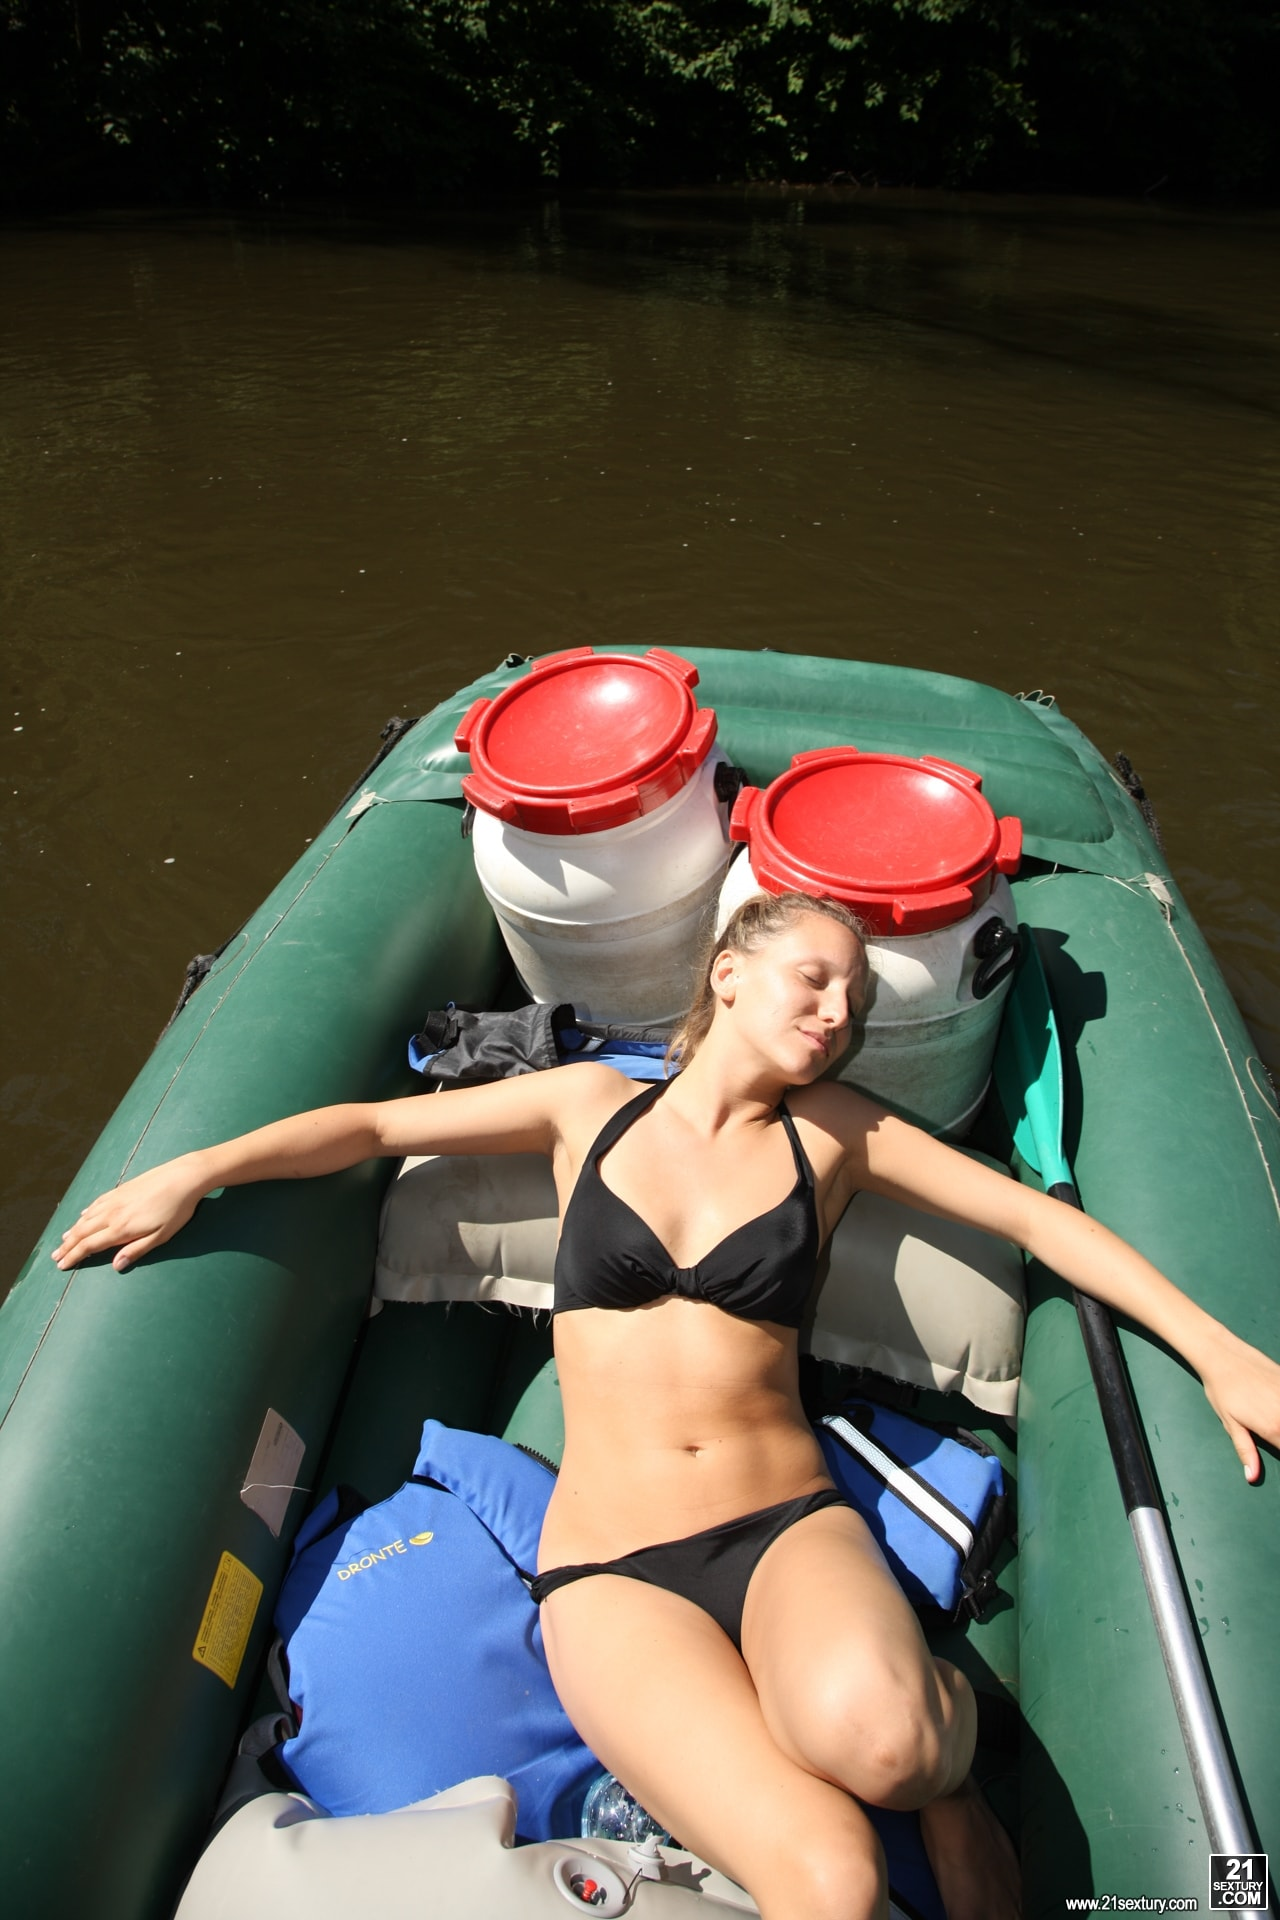 21Sextury 'Nessy's Boat Masturbation' starring Nessy (Photo 1)